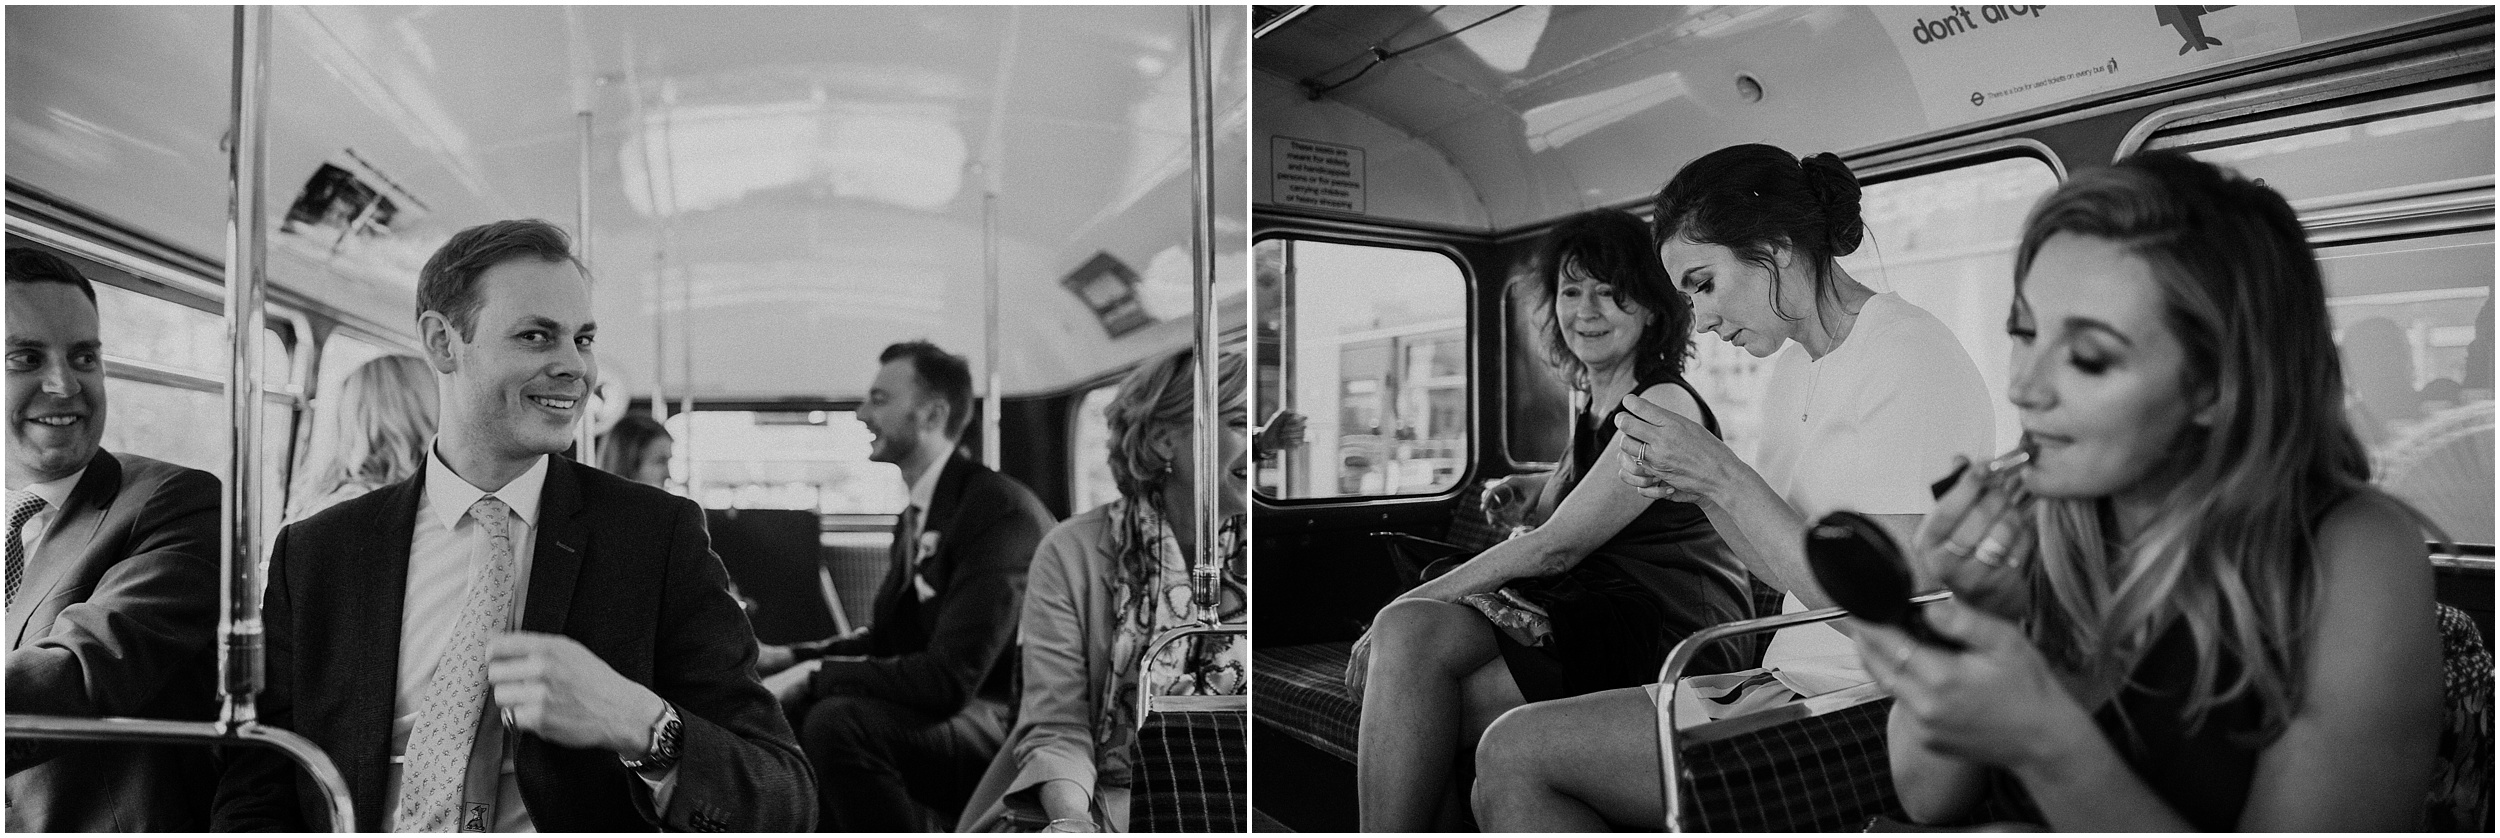 4_170506_Seb&Luise_bus-78.jpg